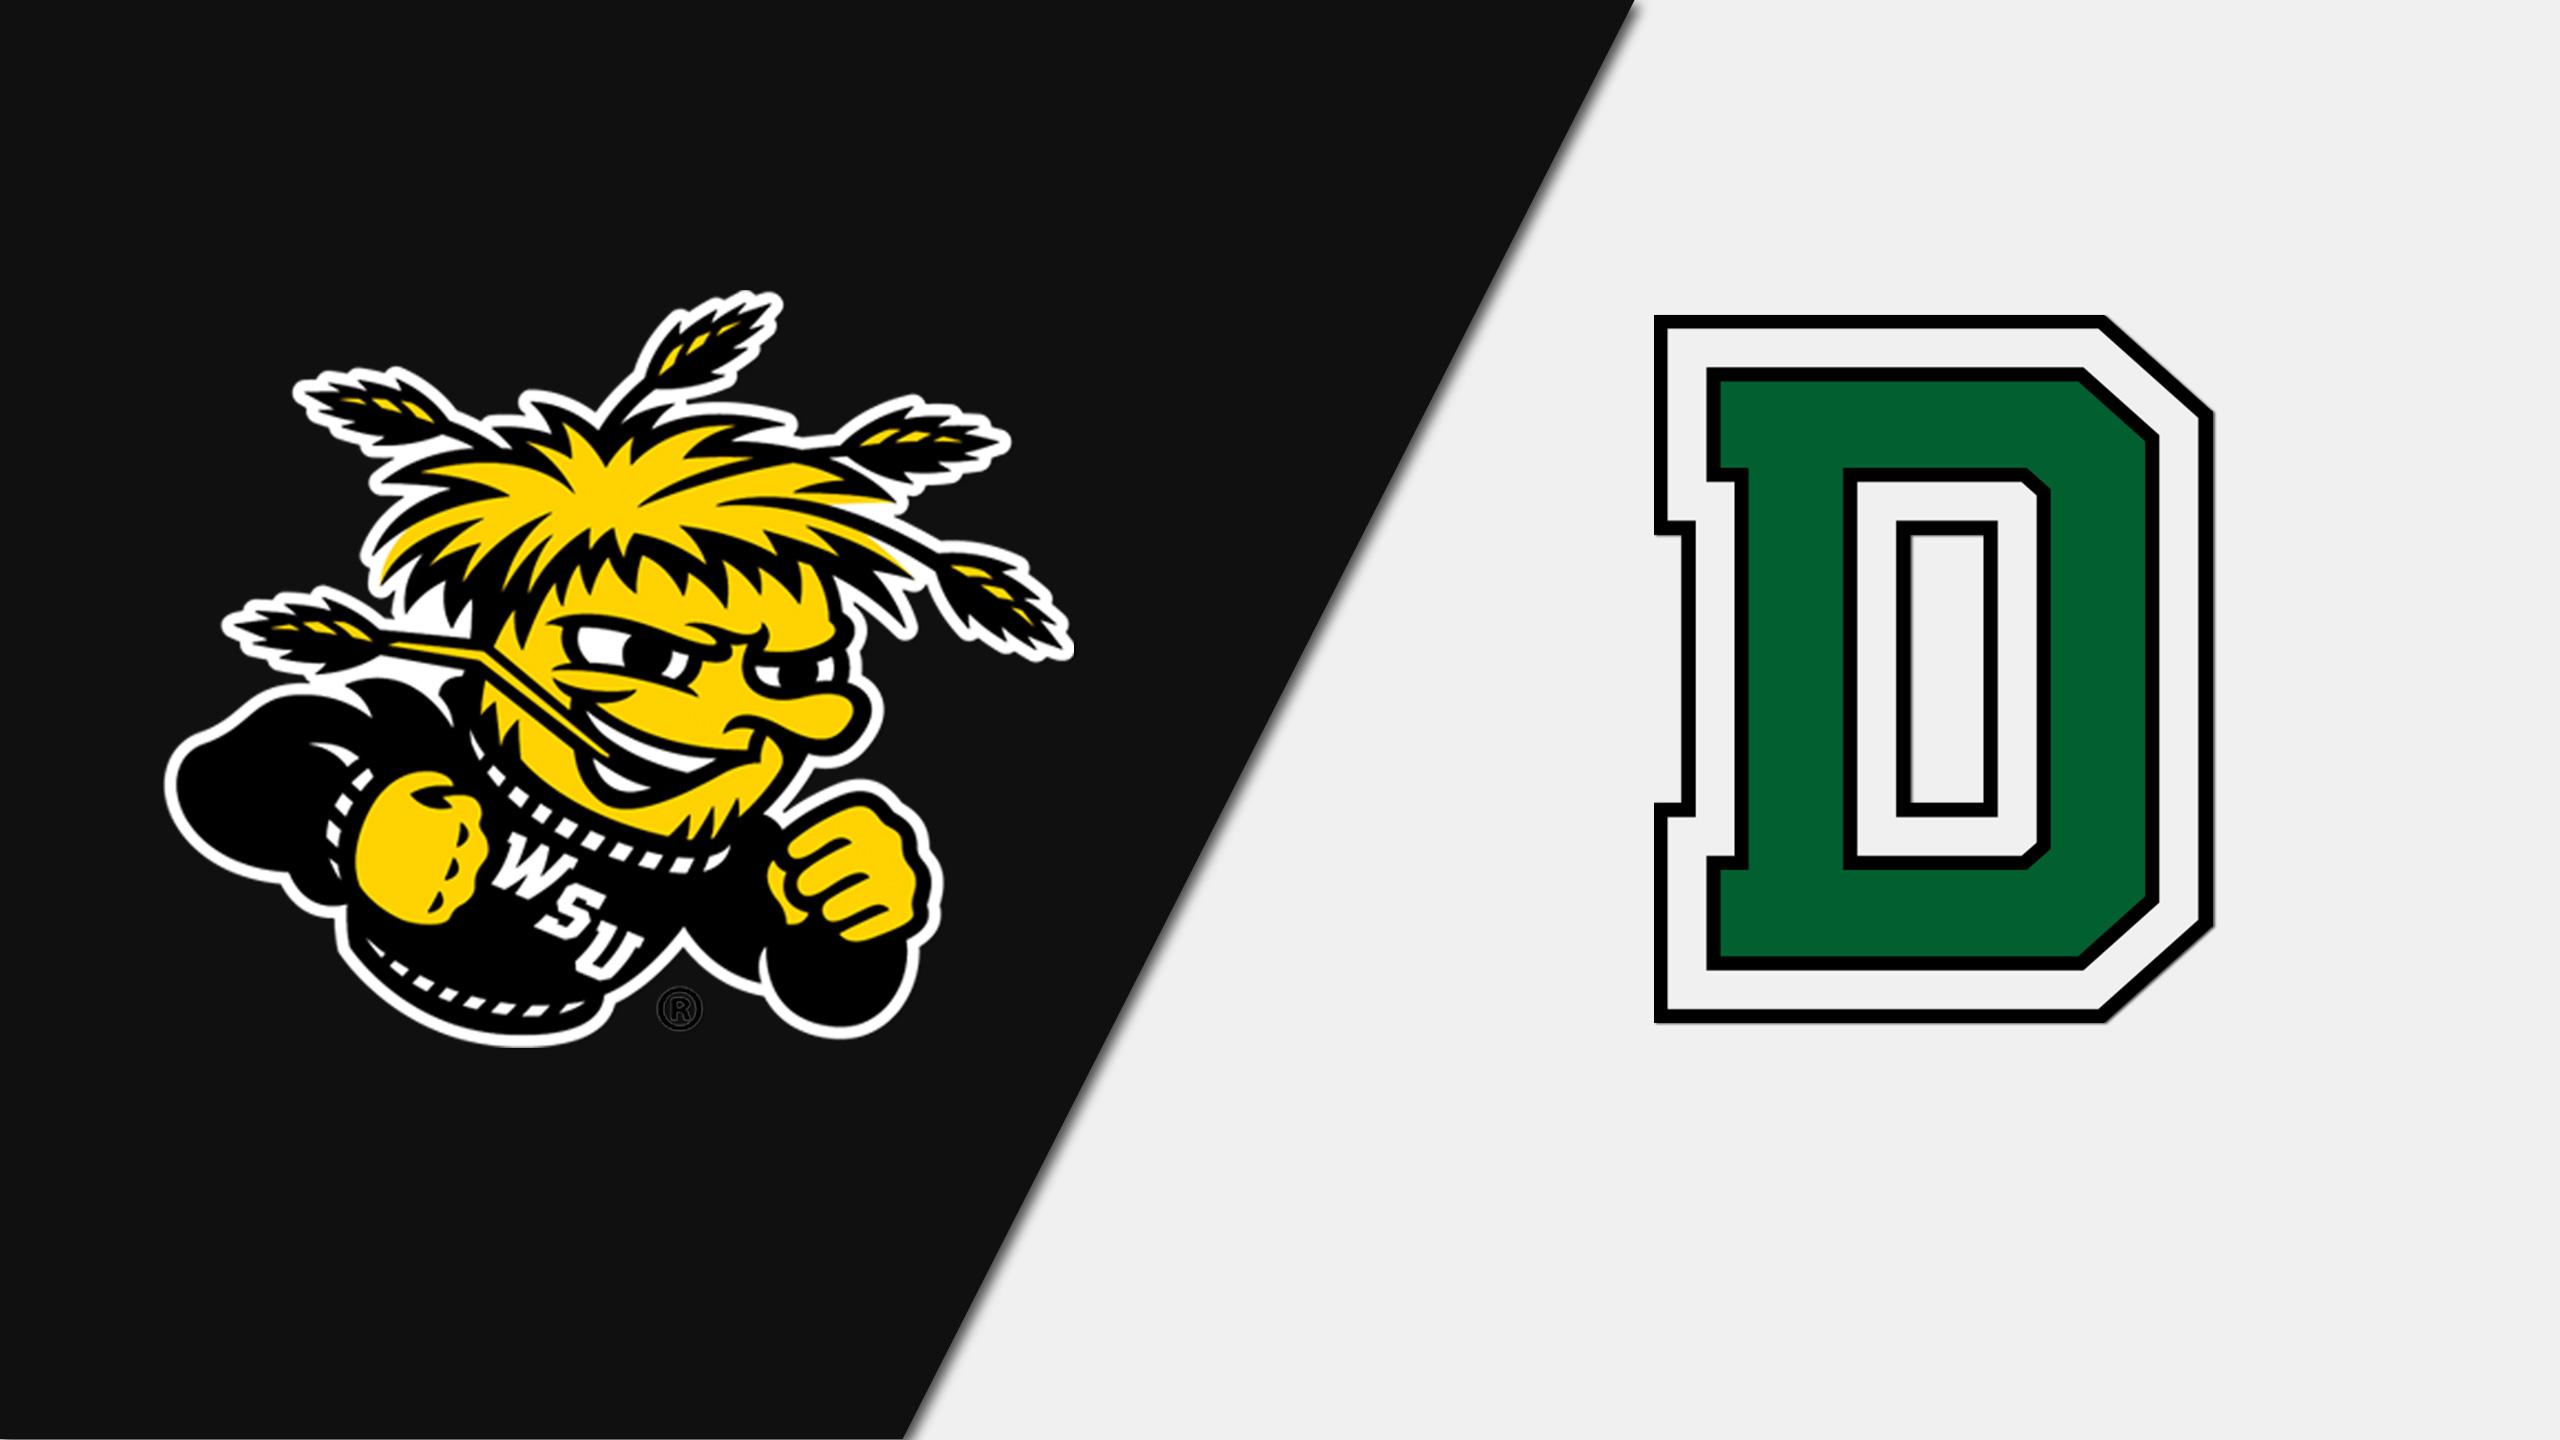 Wichita State vs. Dartmouth (Court 2)